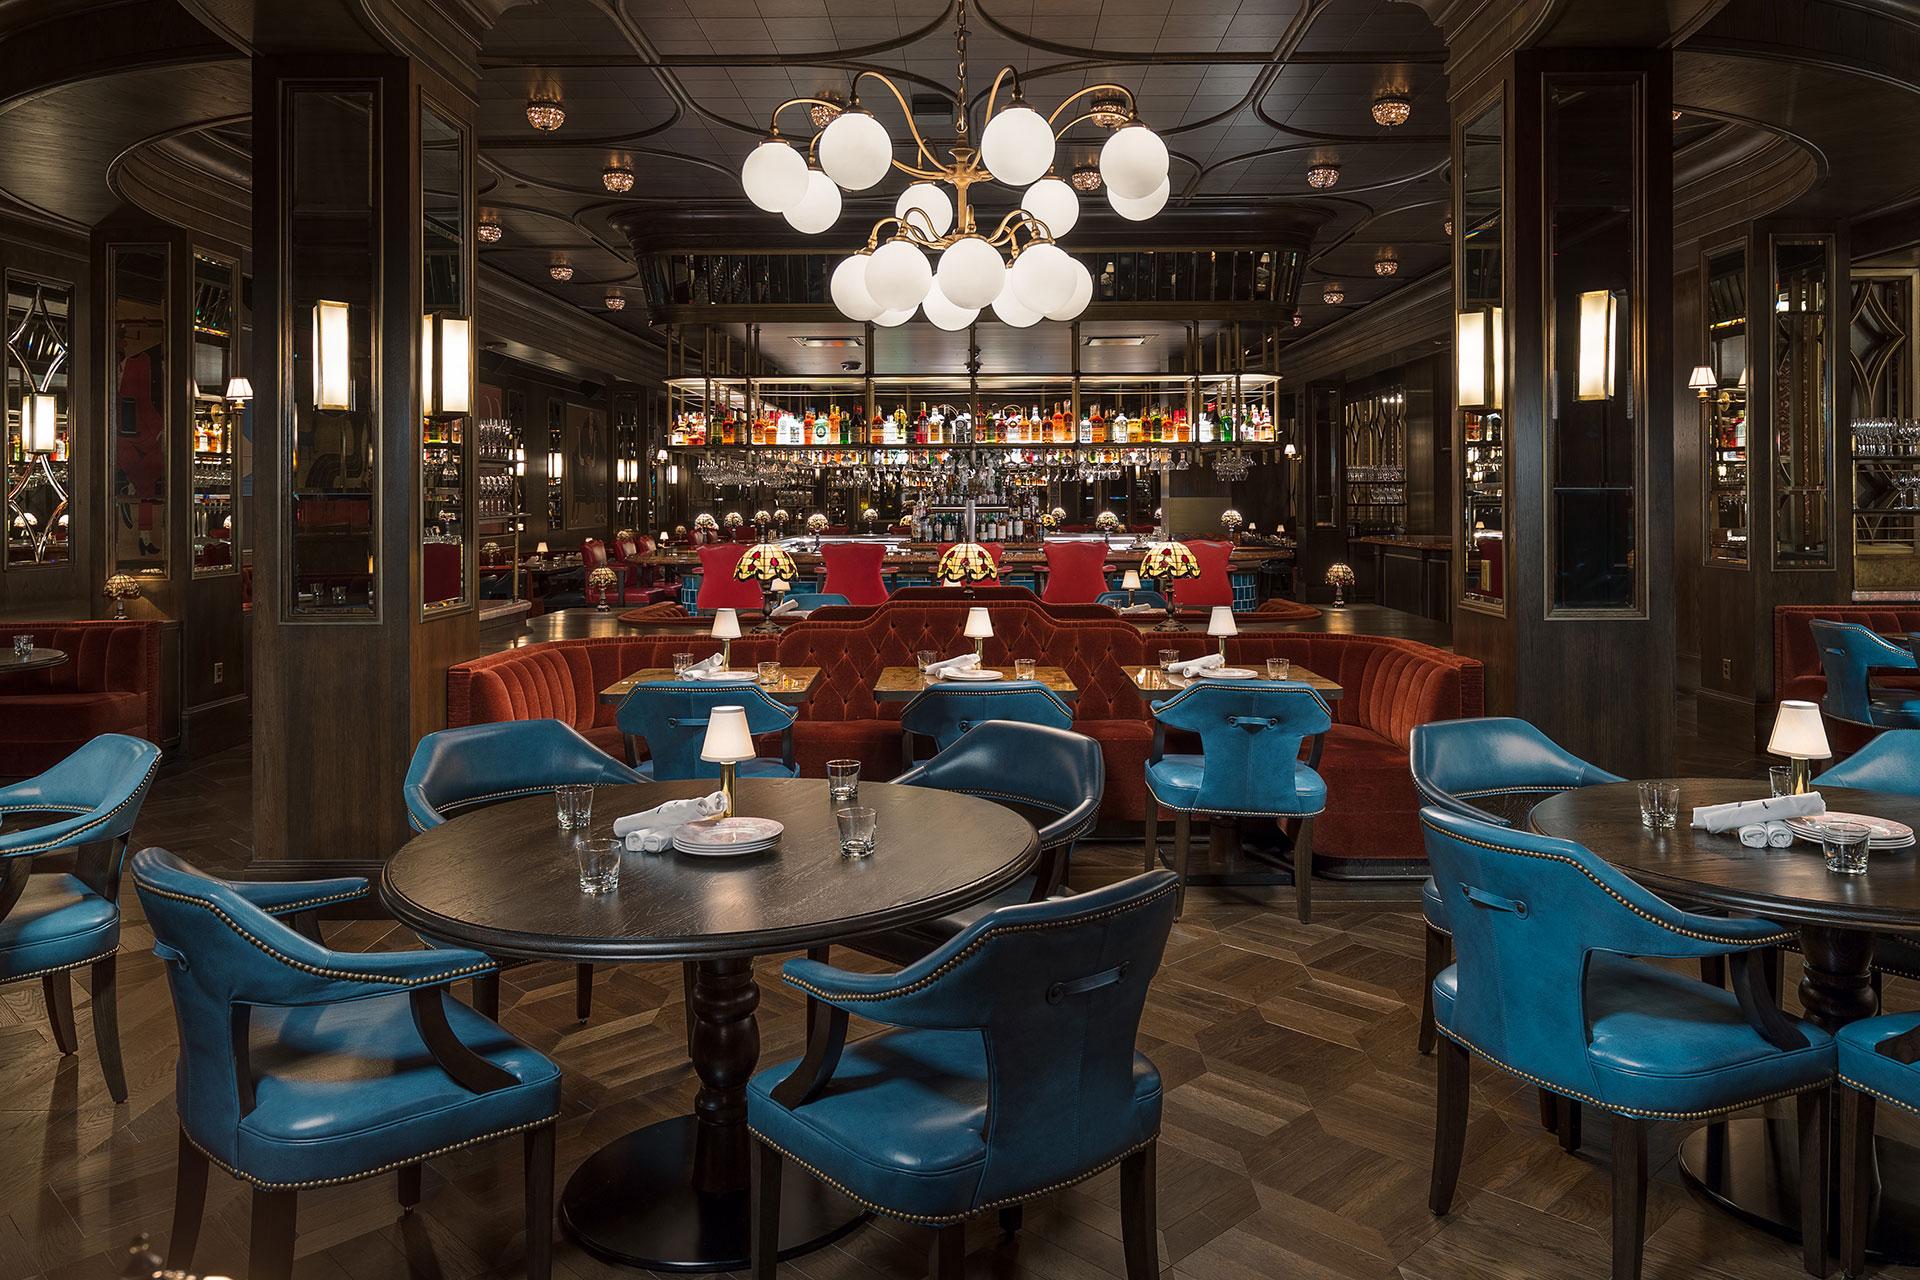 Bavette's Las Vegas – Dining Room